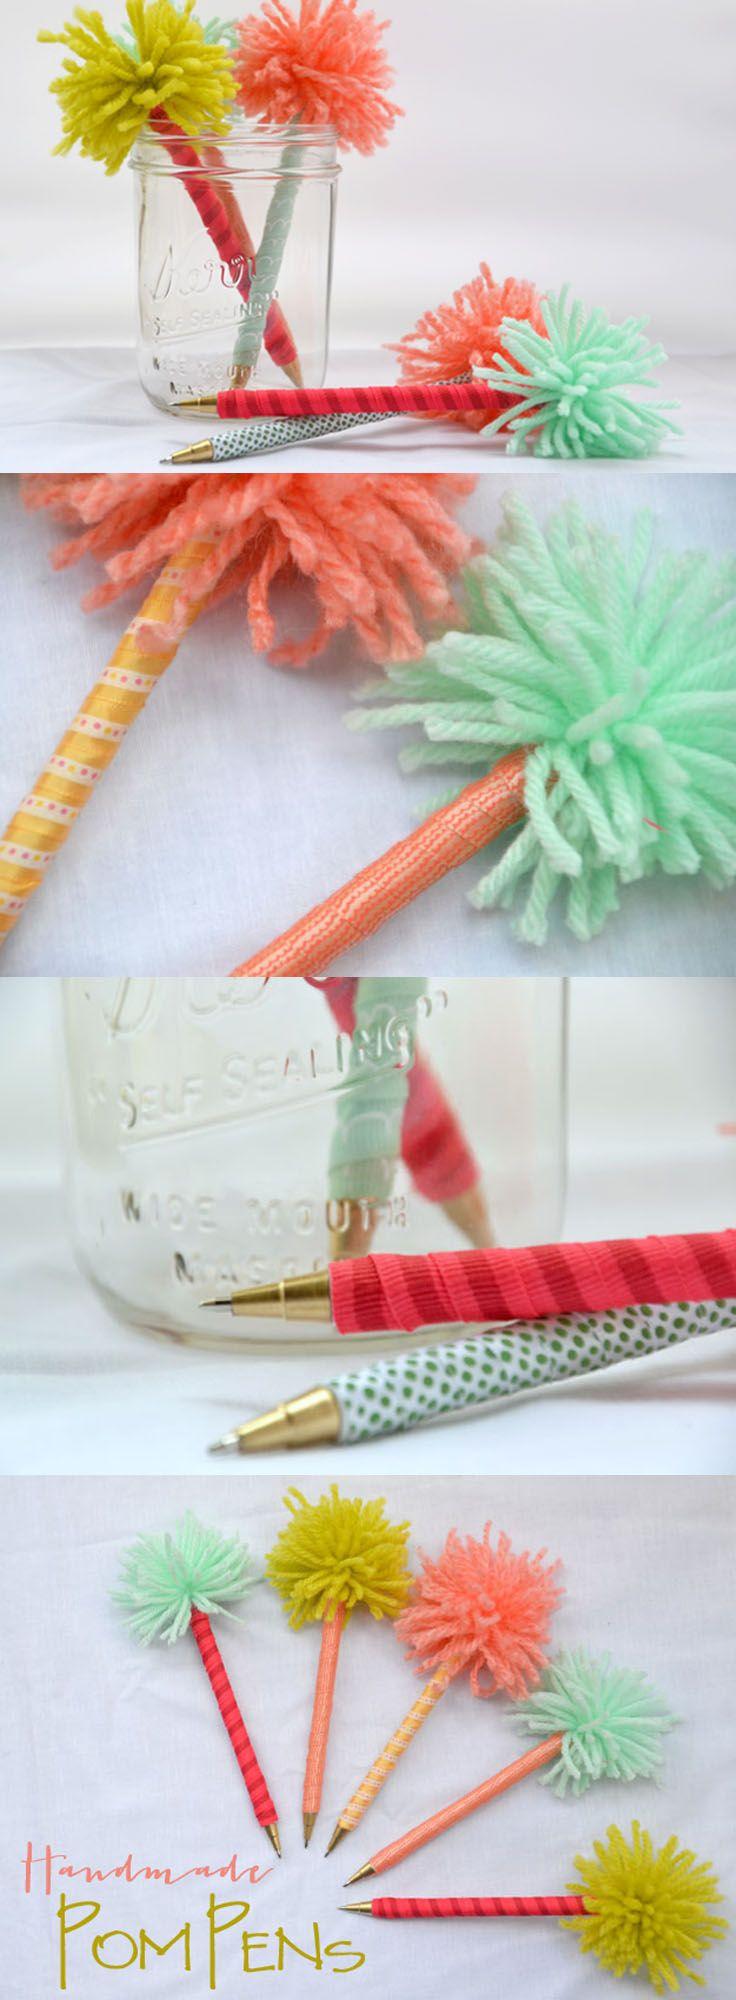 Handmade Gifts: Pom Pens | Hearts & Sharts #DIYGift